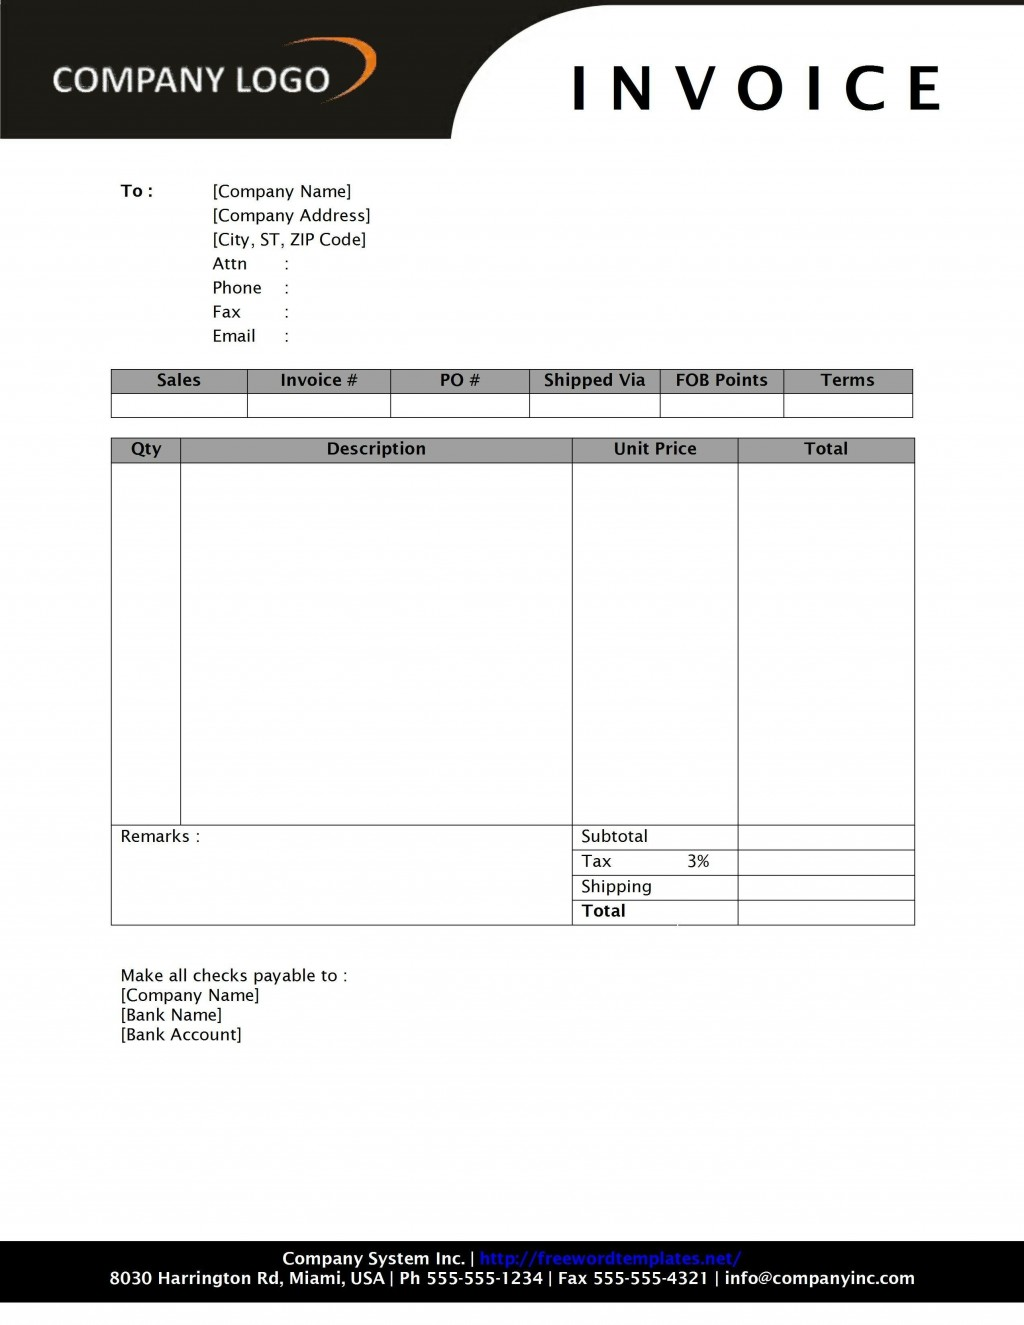 000 Best Microsoft Word Invoice Template Free Idea  Tax Office M DownloadLarge